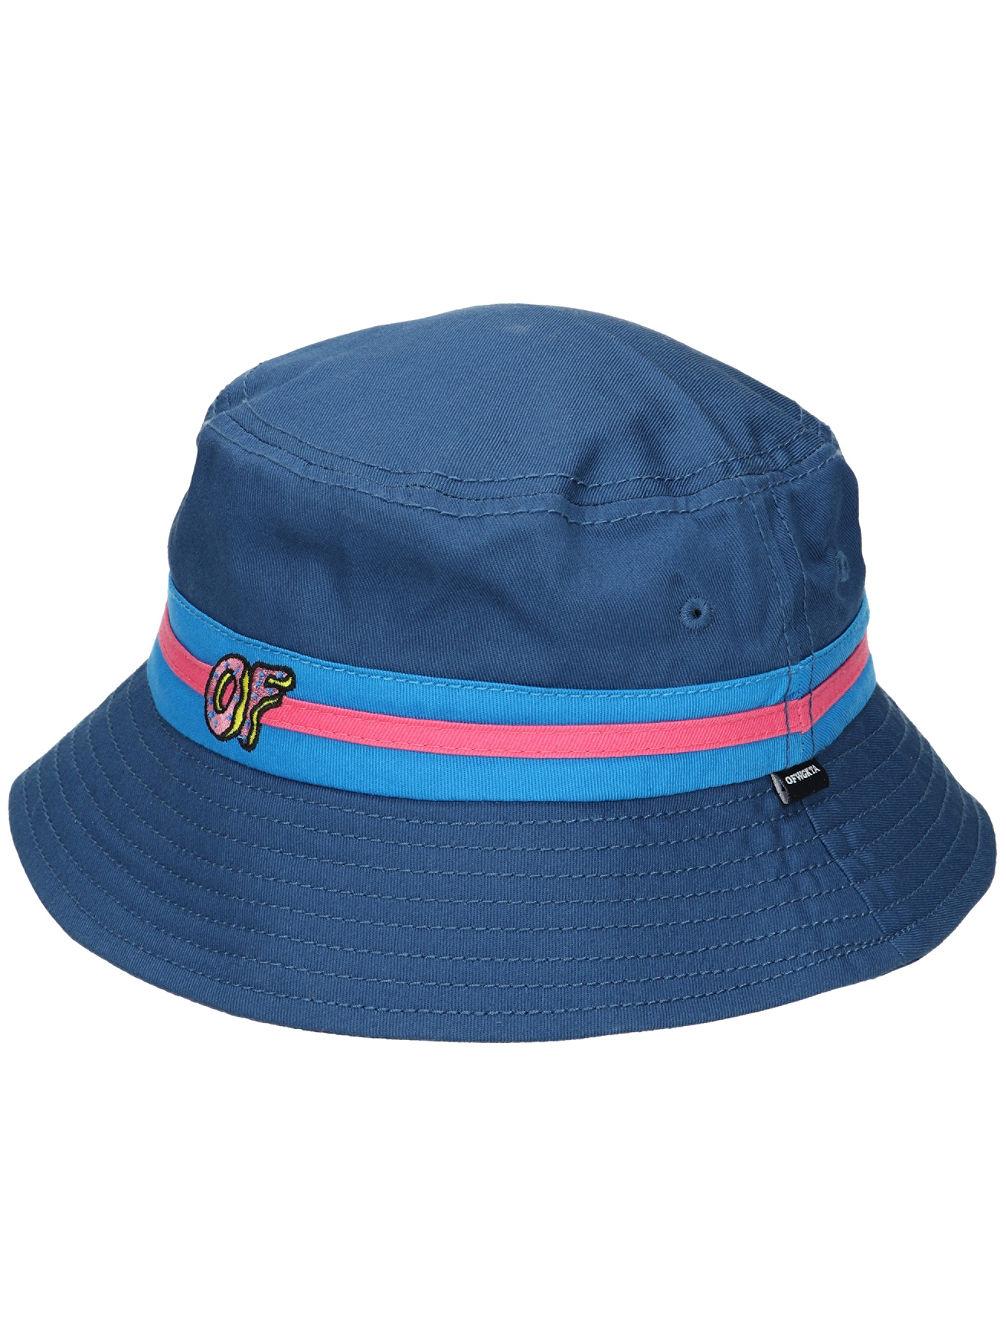 c4e97012768c8 Buy Odd Future Band Bucket Hat online at Blue Tomato